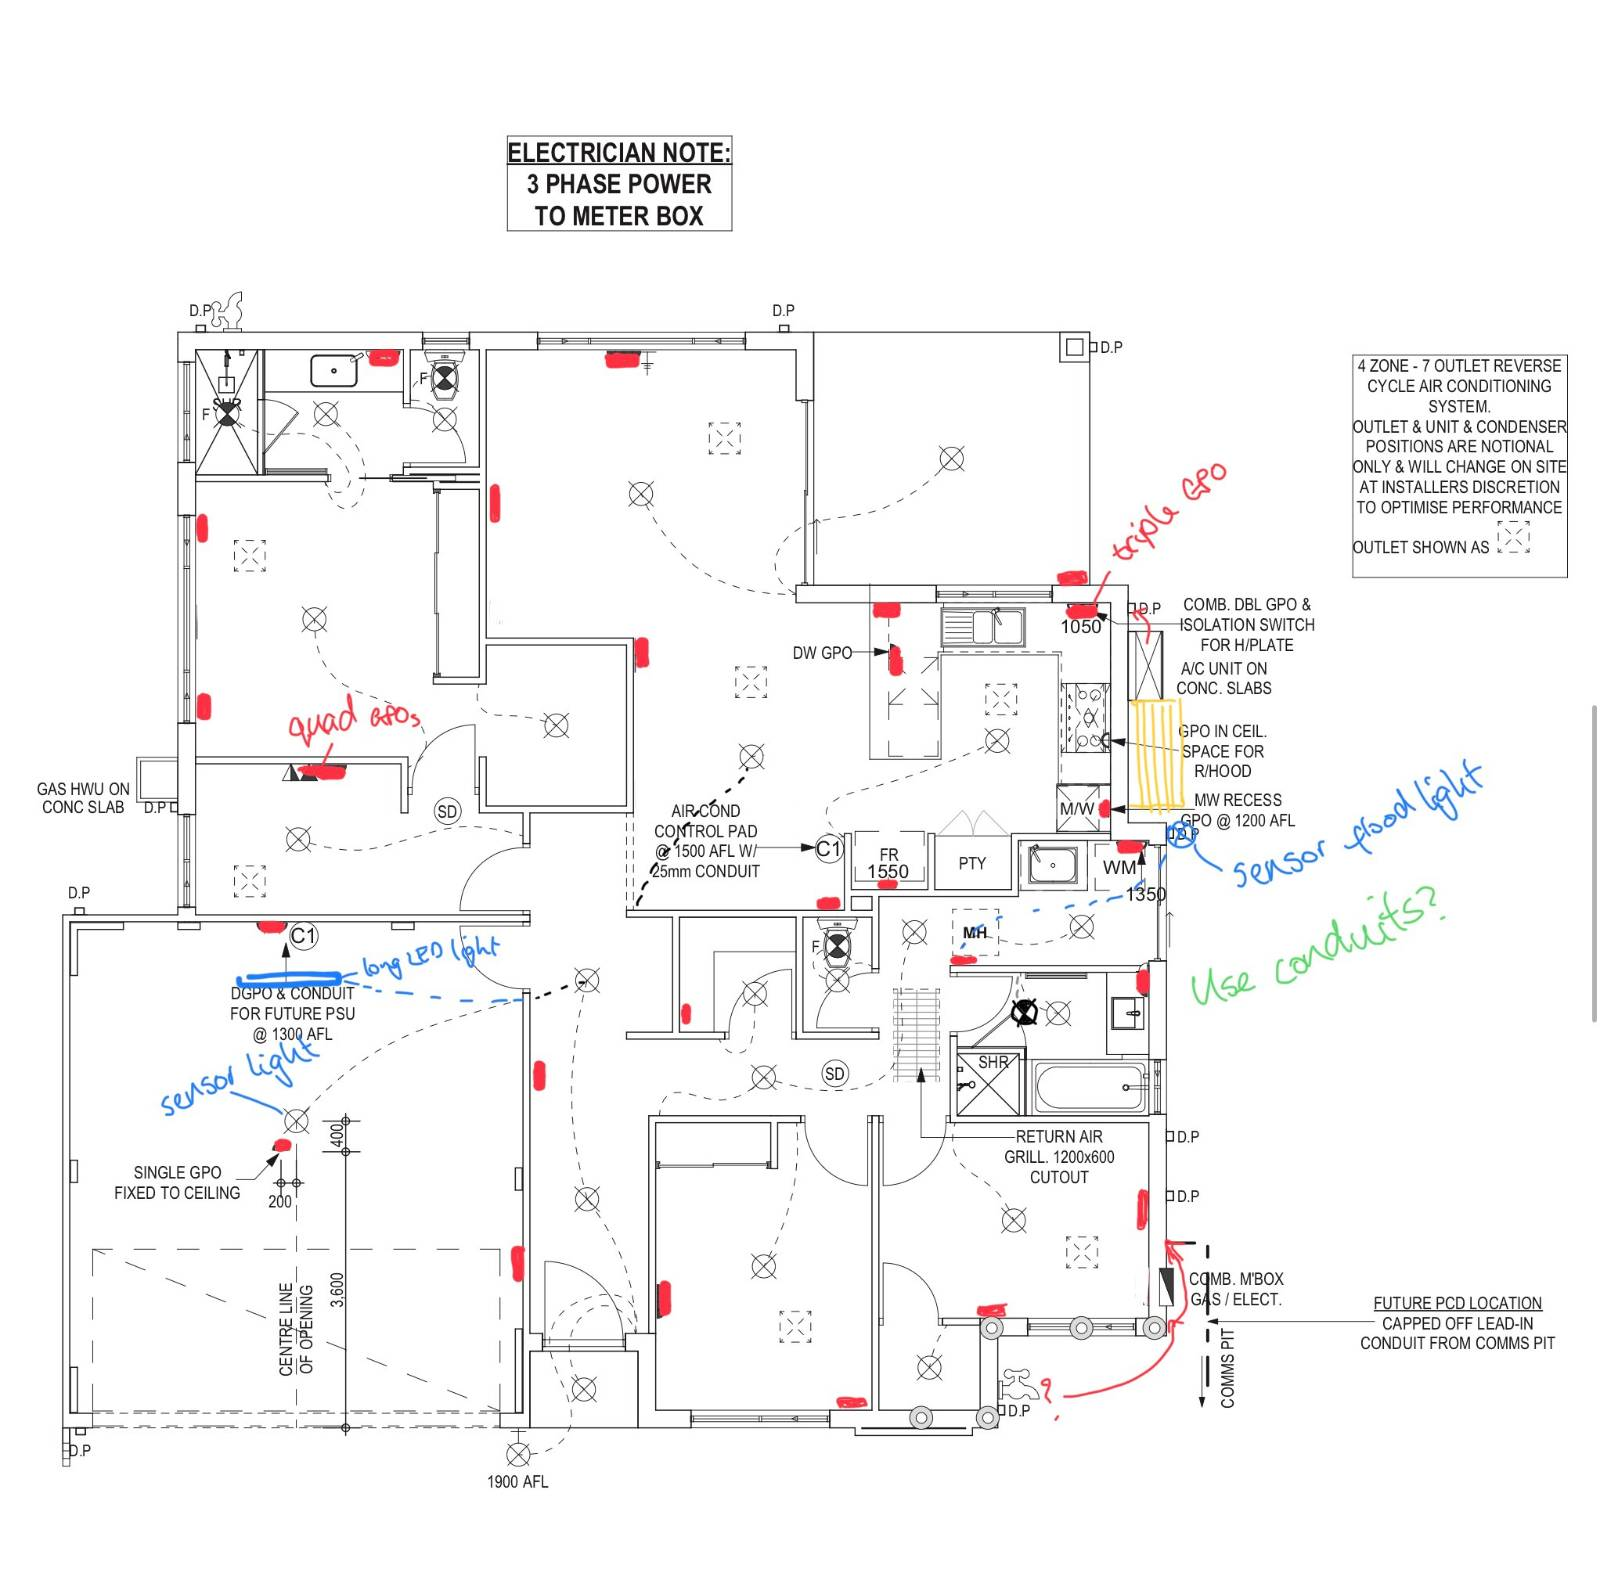 Electrical Plan Critique/Help